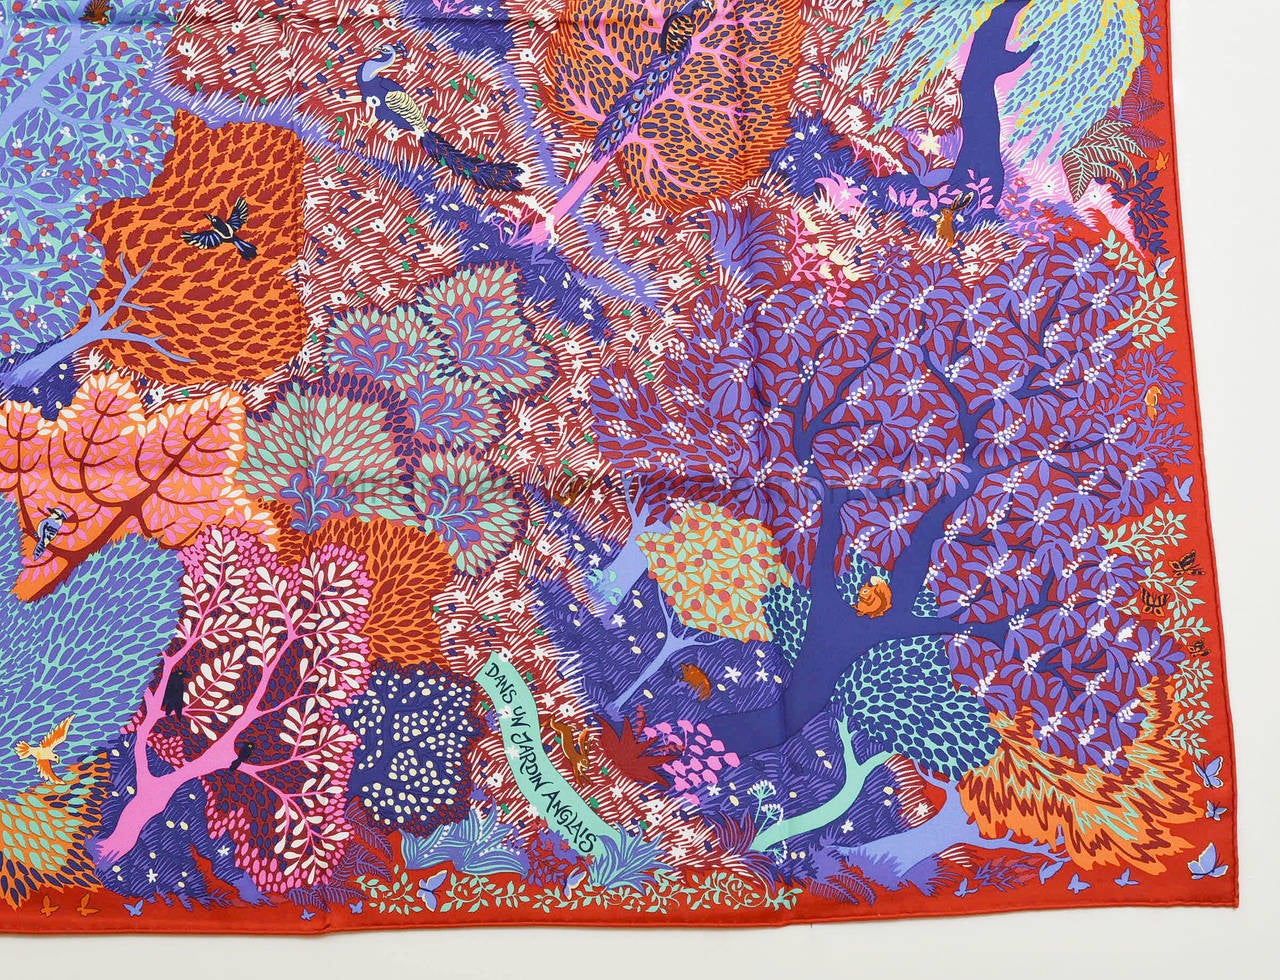 Hermes carre twill dans un jardin anglais silk red purple for Dans un jardin anglais hermes